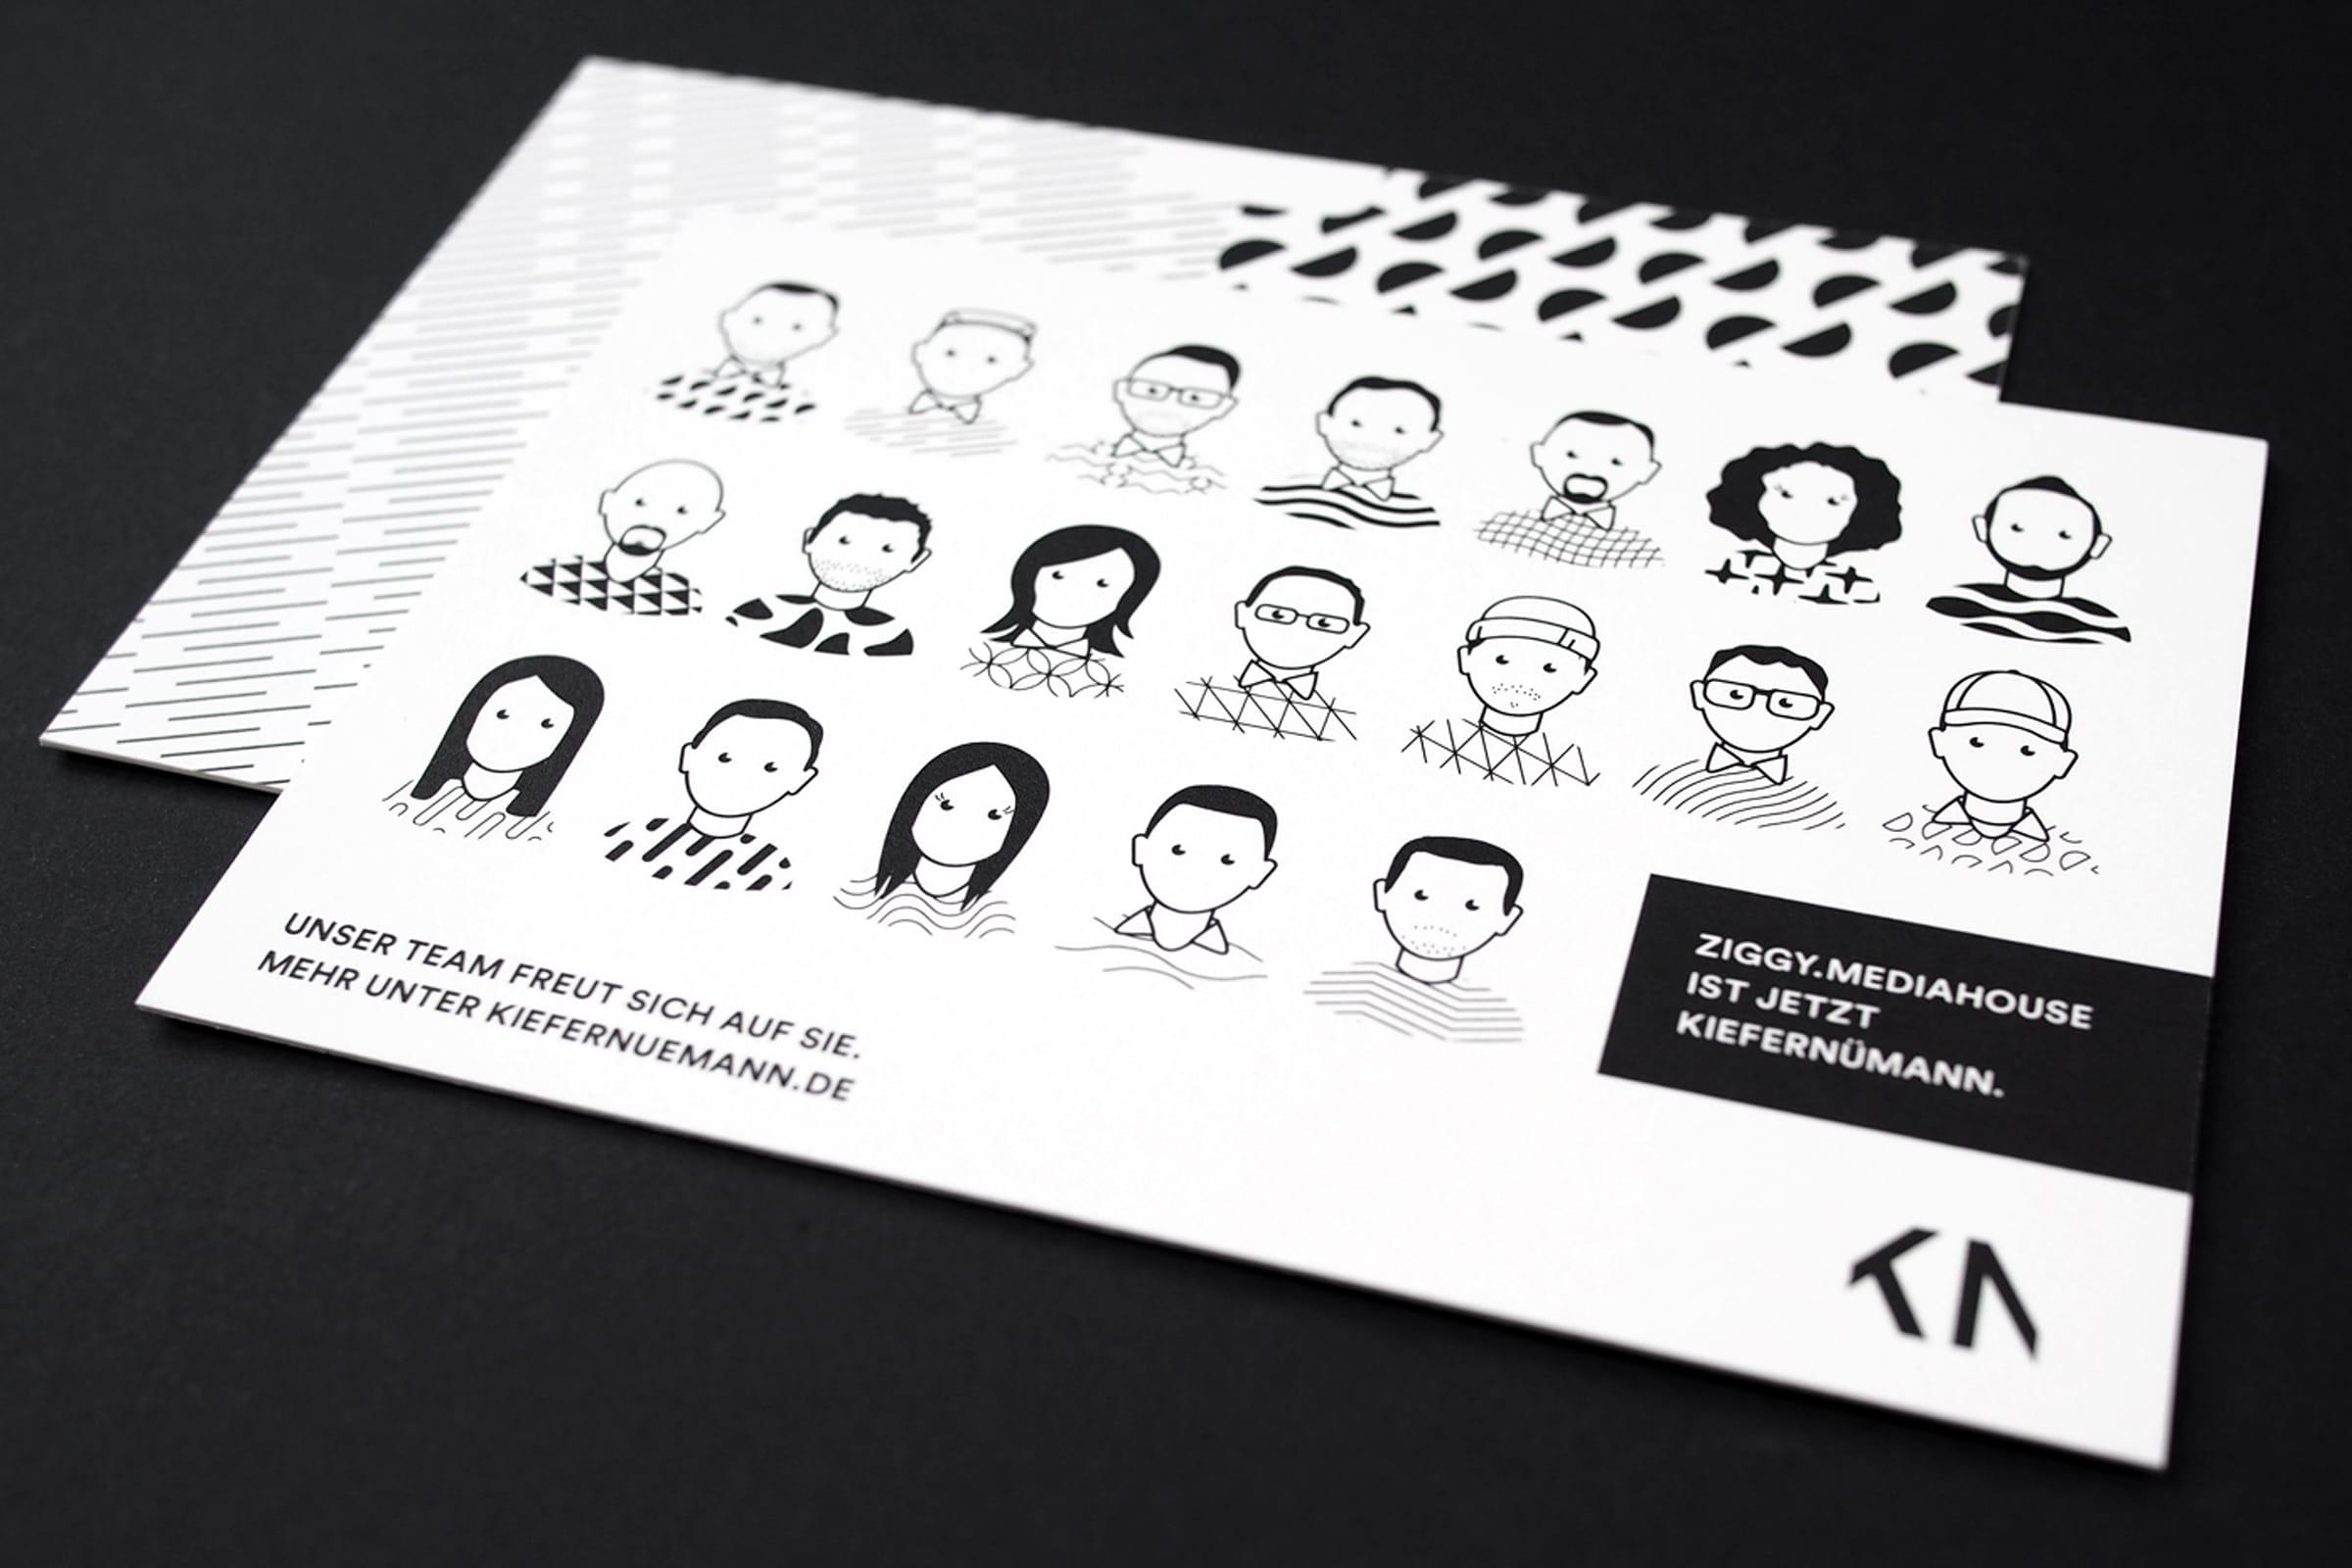 KieferNümann, Mailing, Illustration, Design